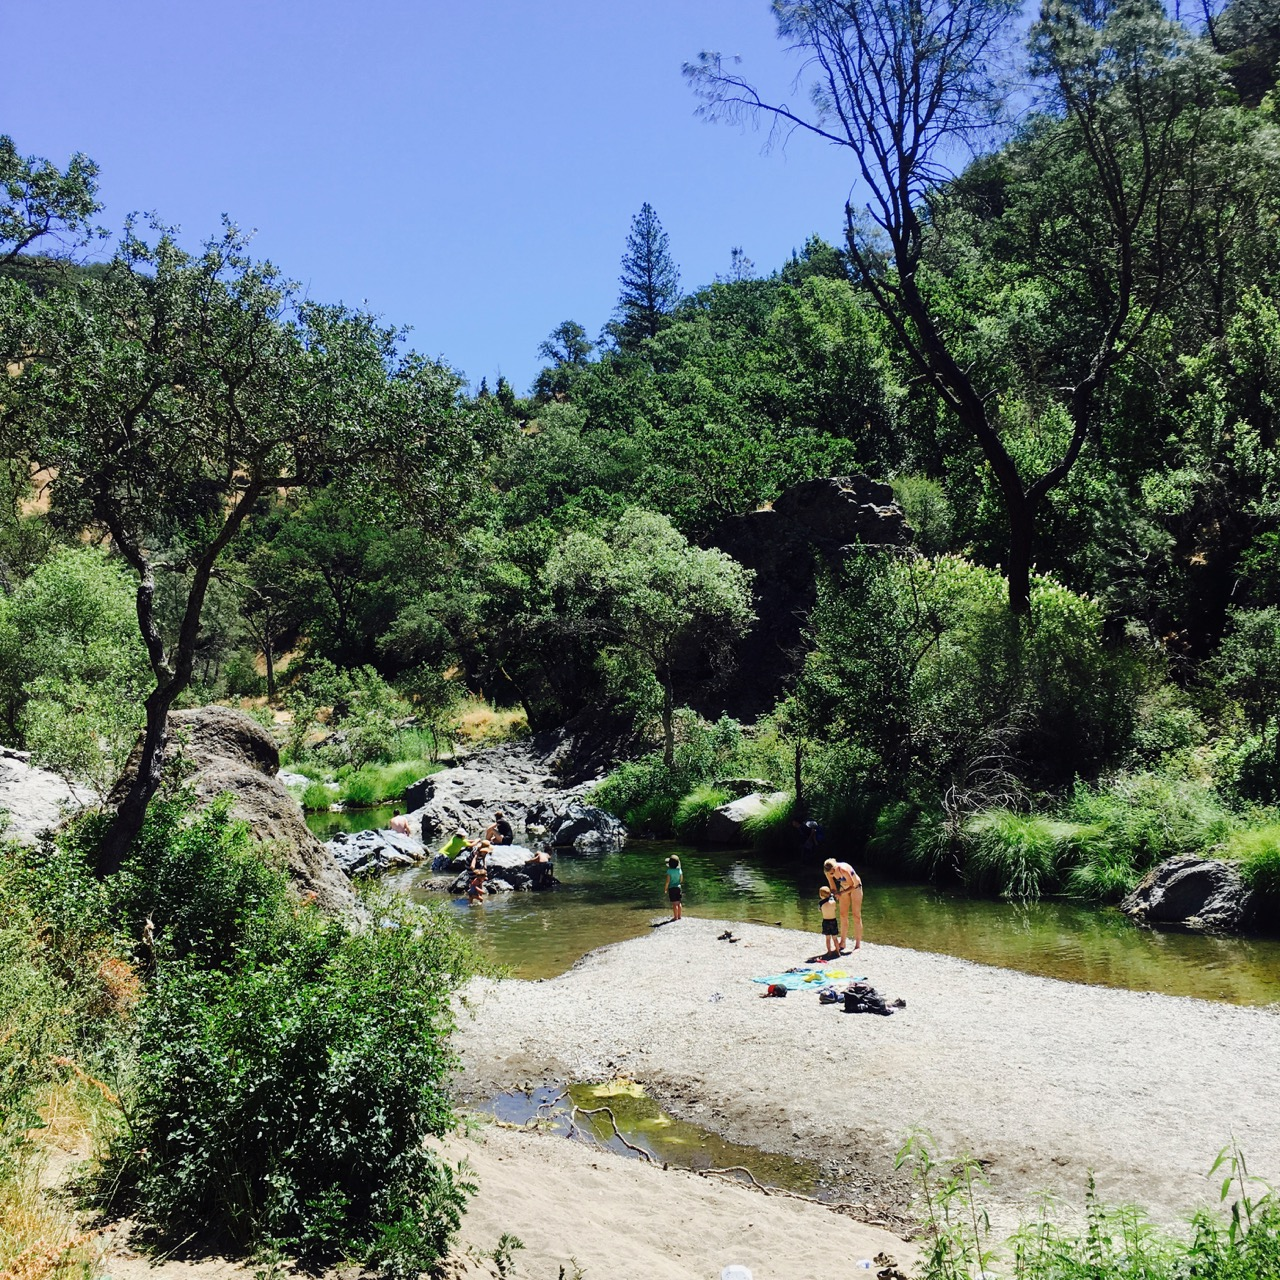 China Hole swimming in Morgan Hill, California